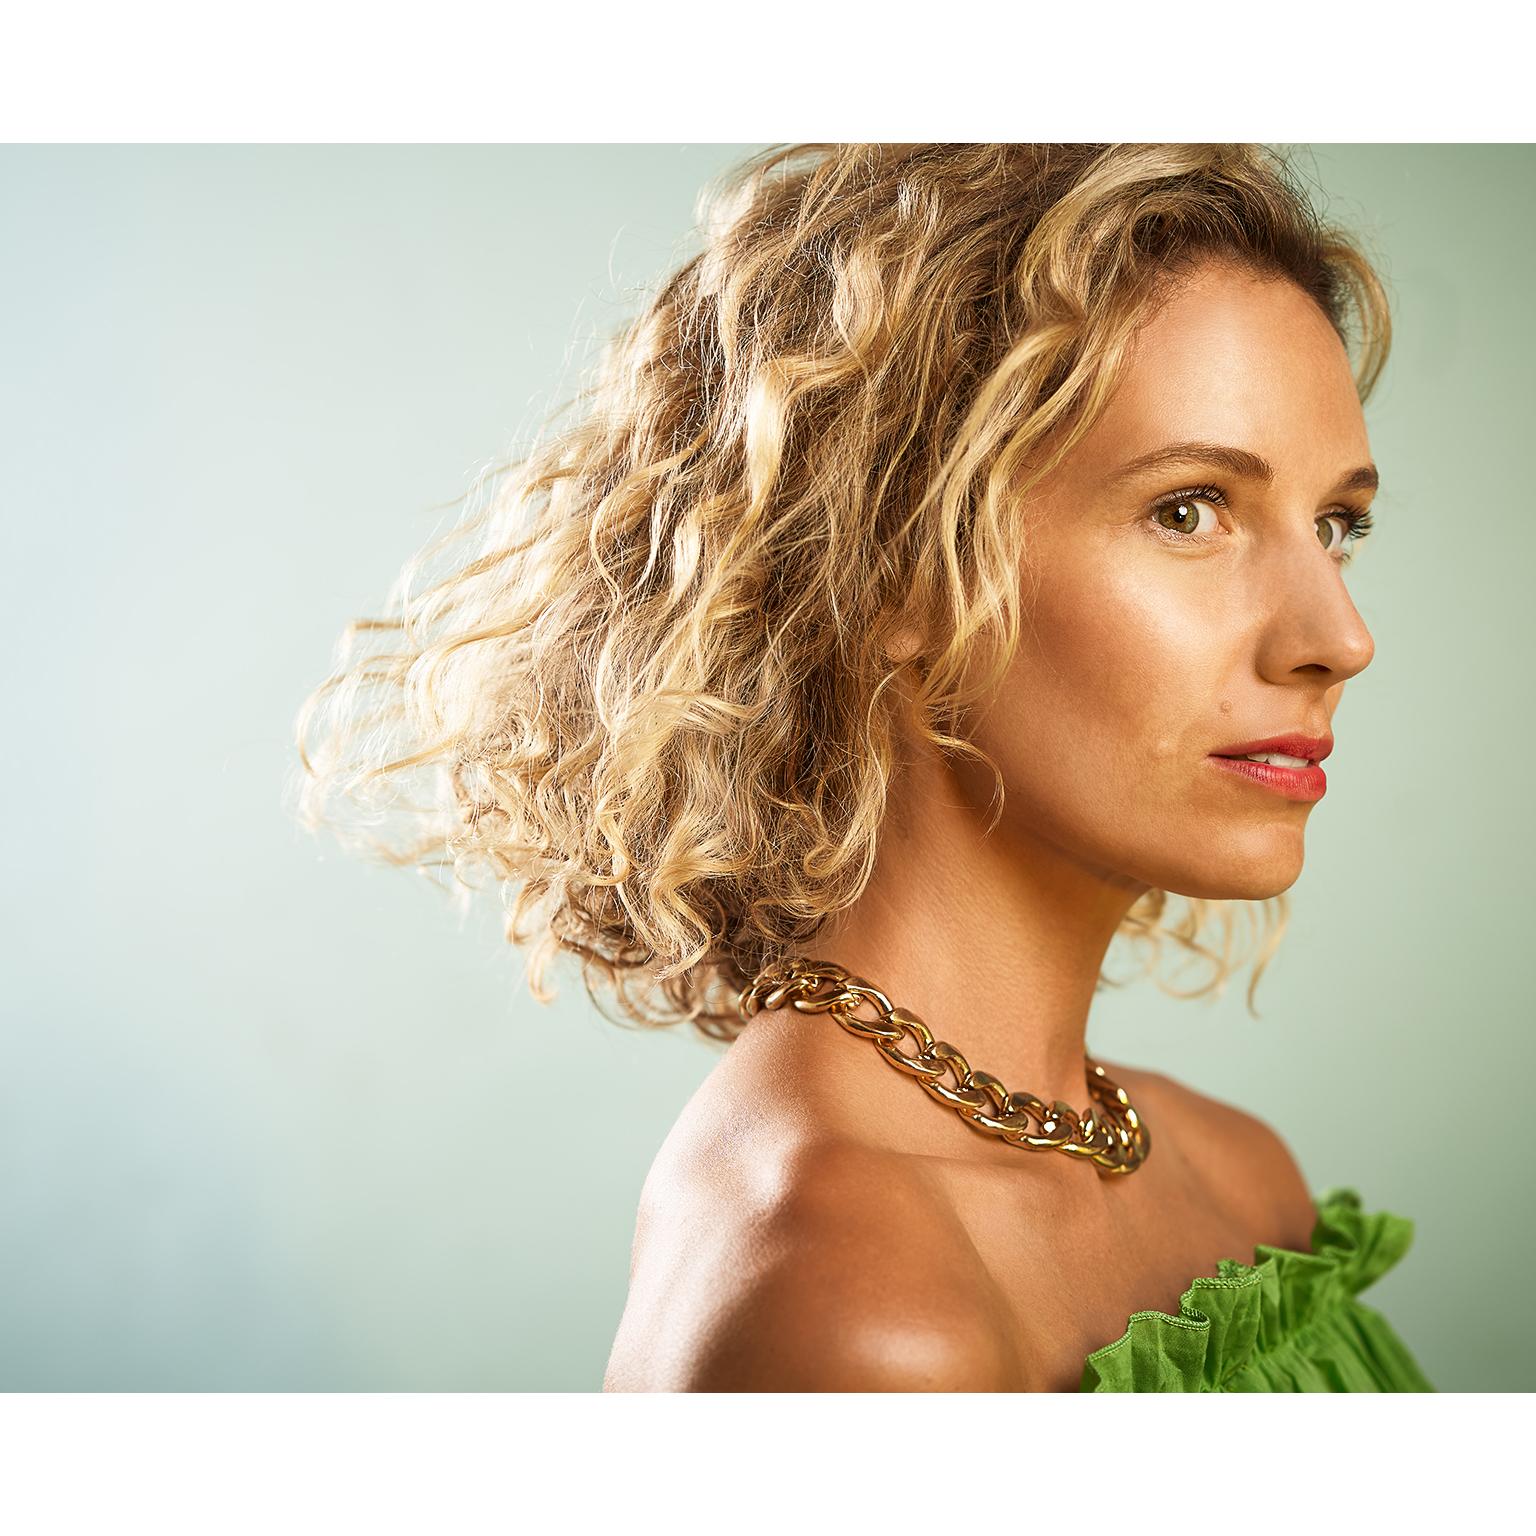 Toronto-Fitness-Model-Agency-Commercial-BEauty-Portrait-Tiffany-Babiak